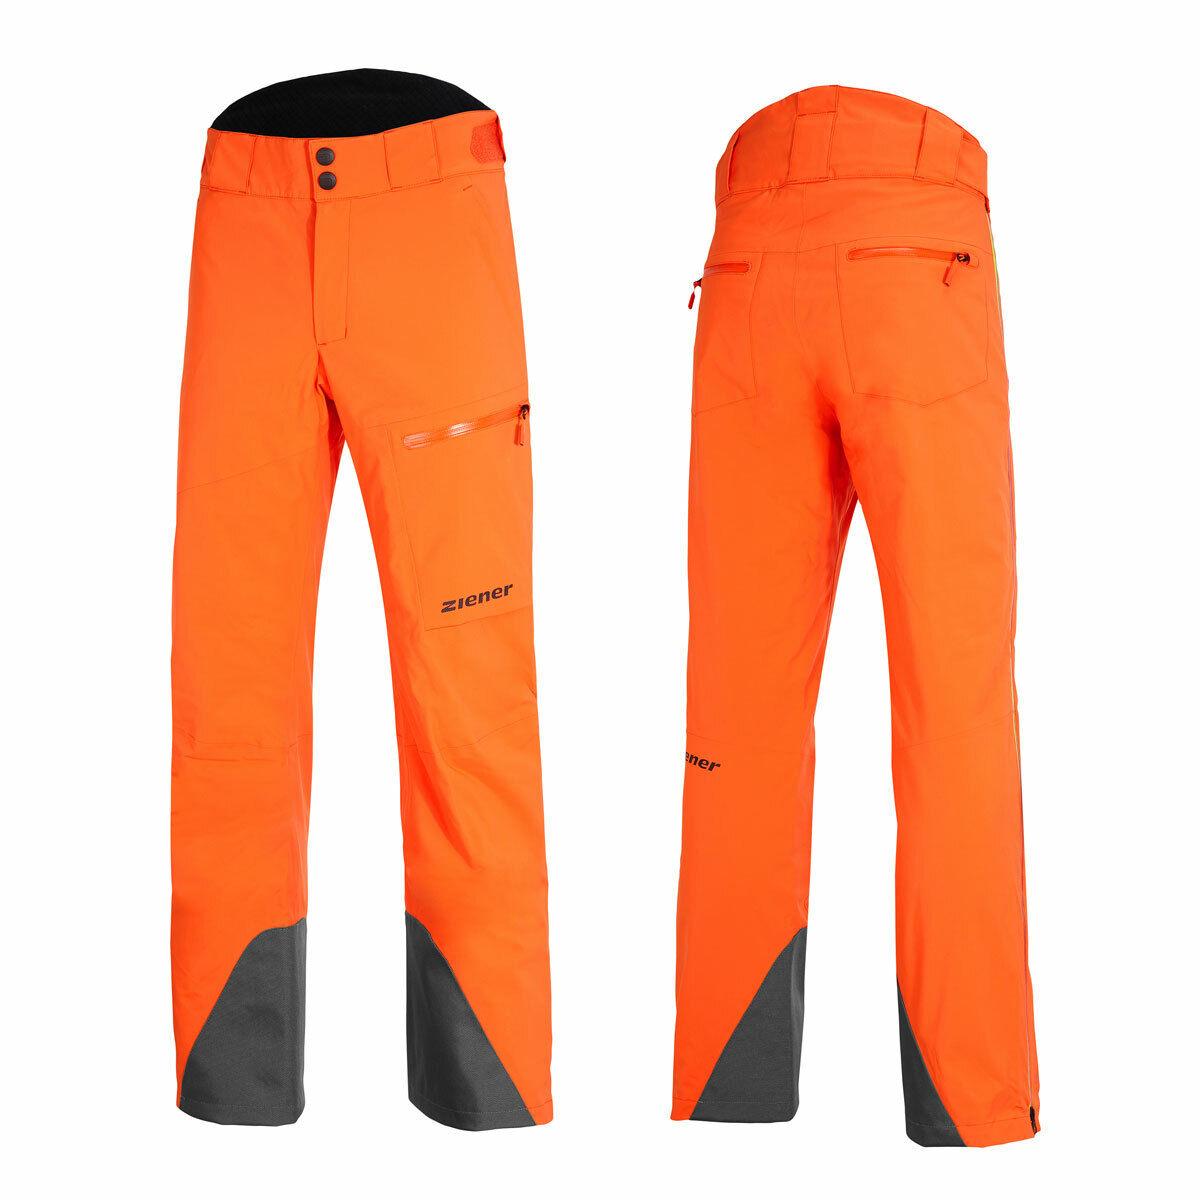 Ziener TILAS Vent-Zip Man Herren Skihose Snowboardhose Teamwear 20K 184937-953993 Blue sea orange Shade